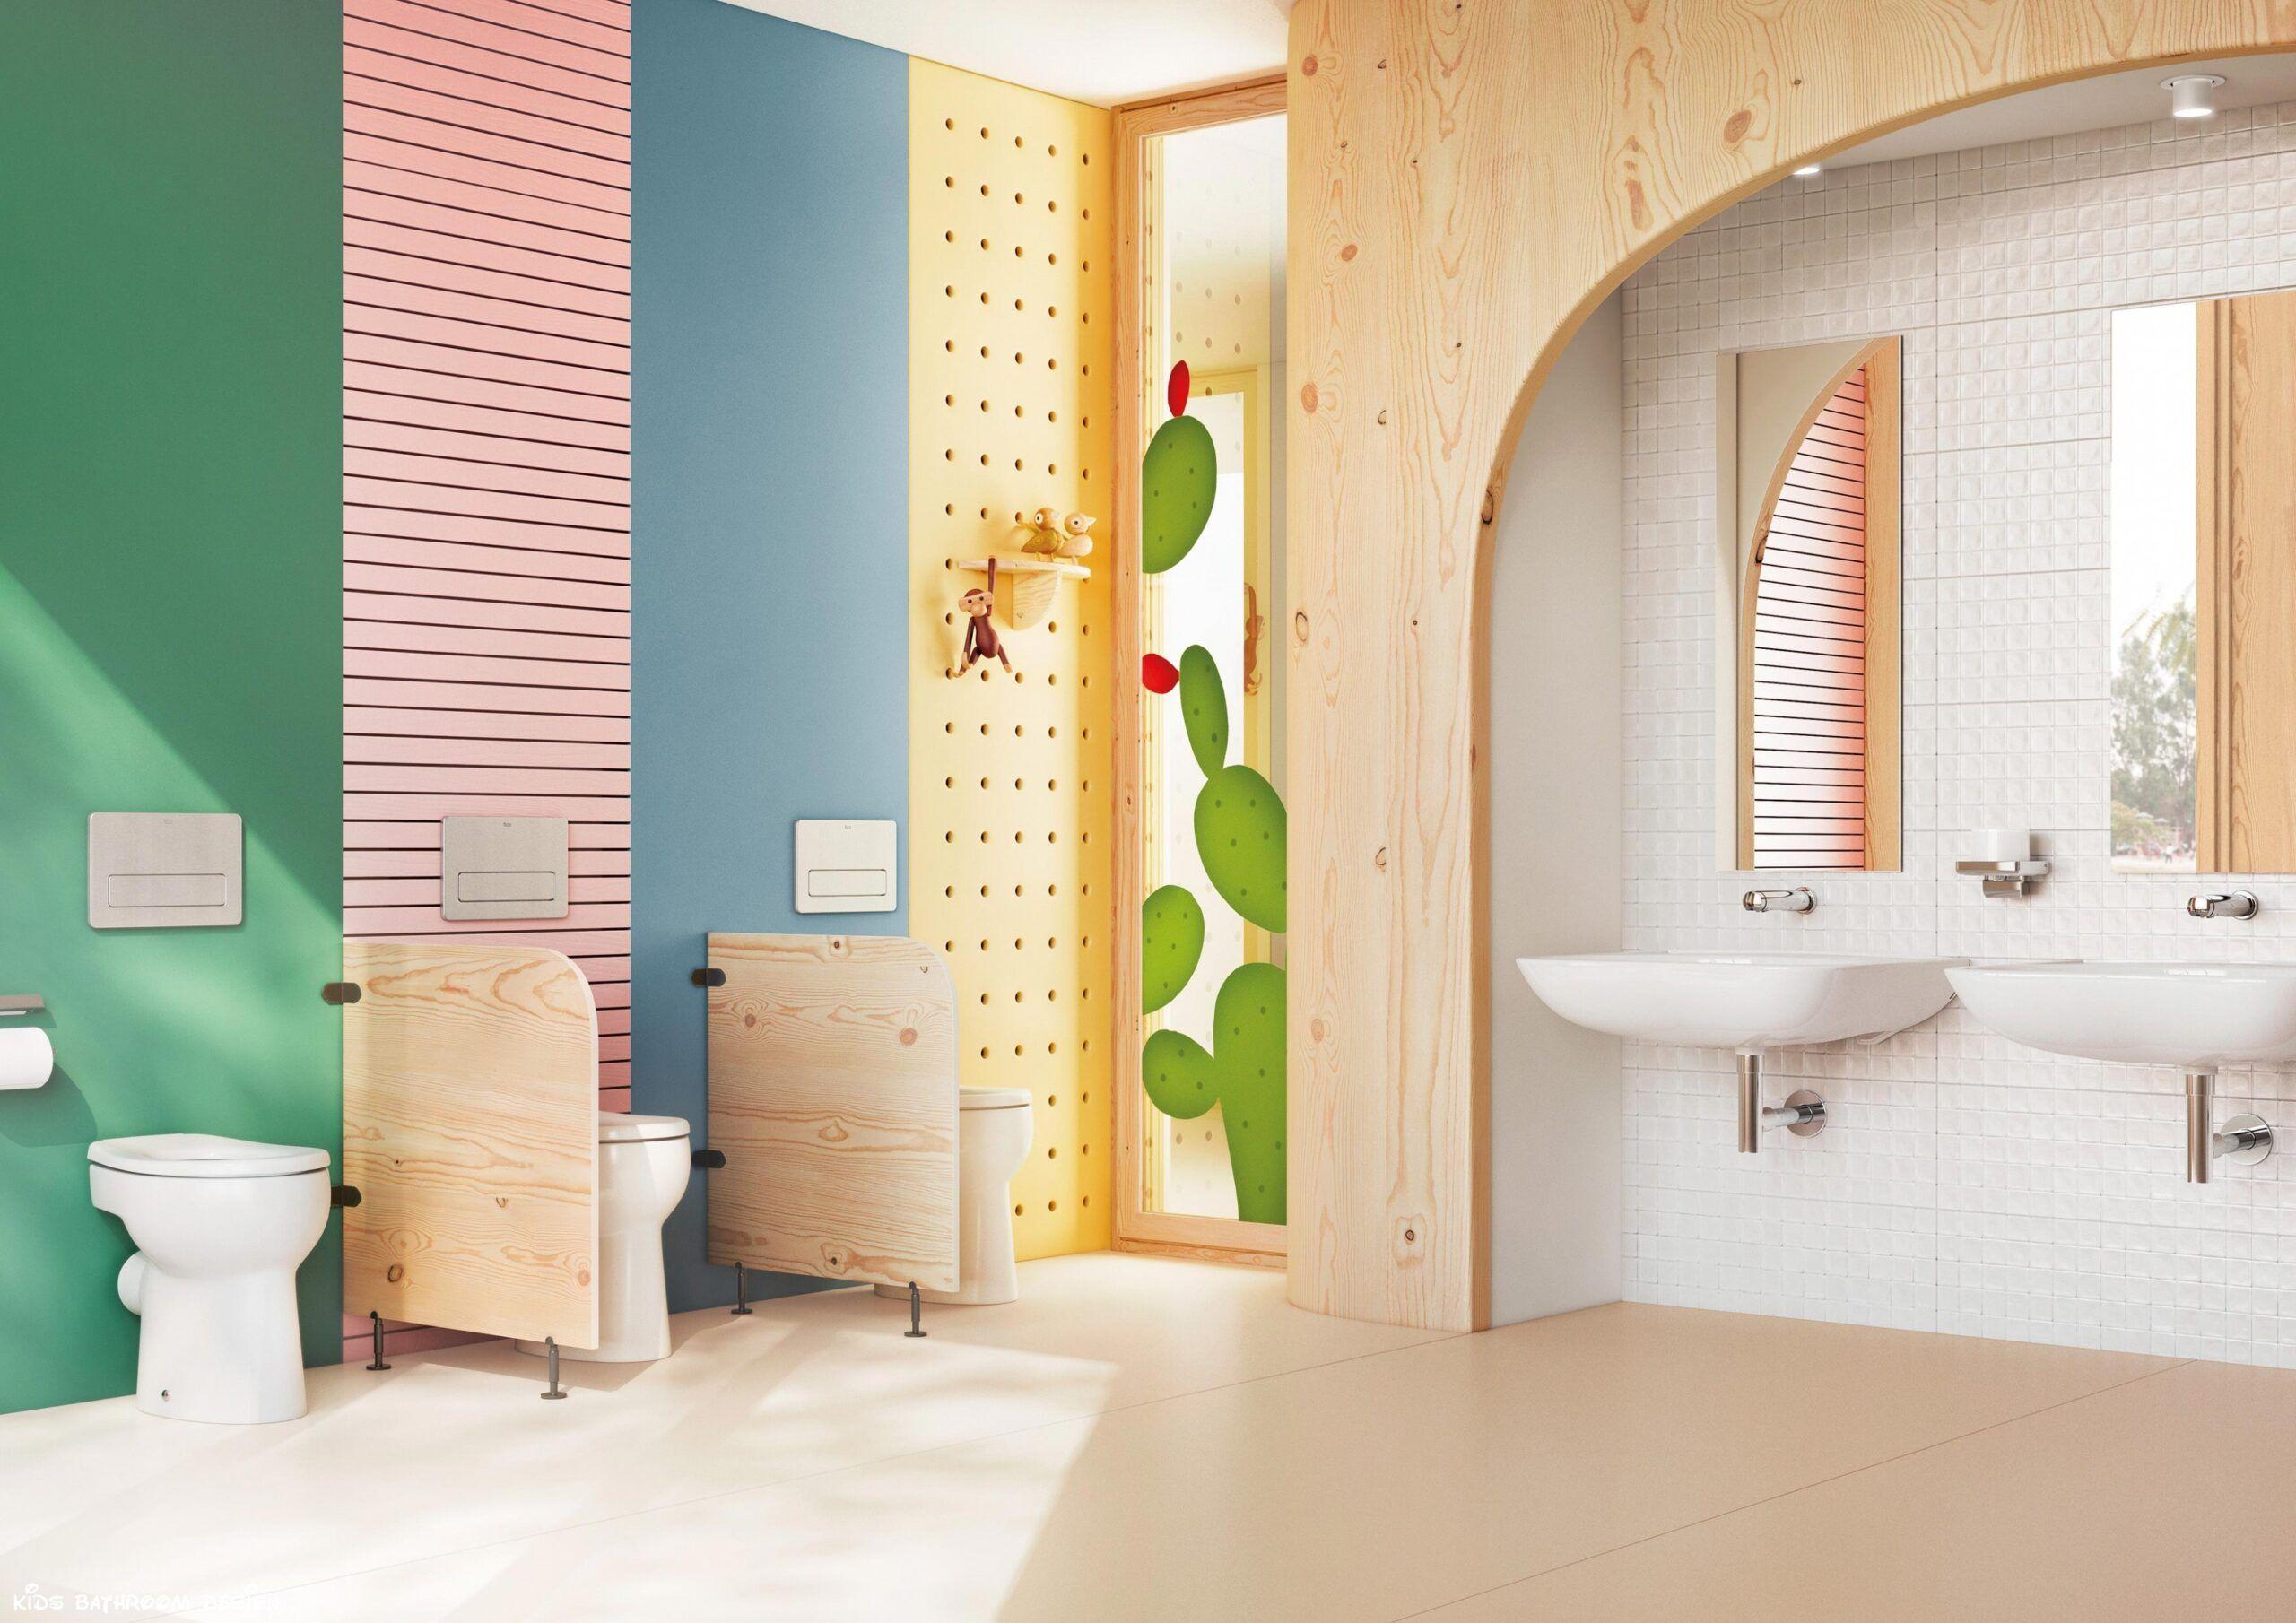 187 Gorgeous Kids Bathroom Design In 2020 Brown Bathroom Decor Bathroom Design Bathroom Redecorating Bathroom design for kids